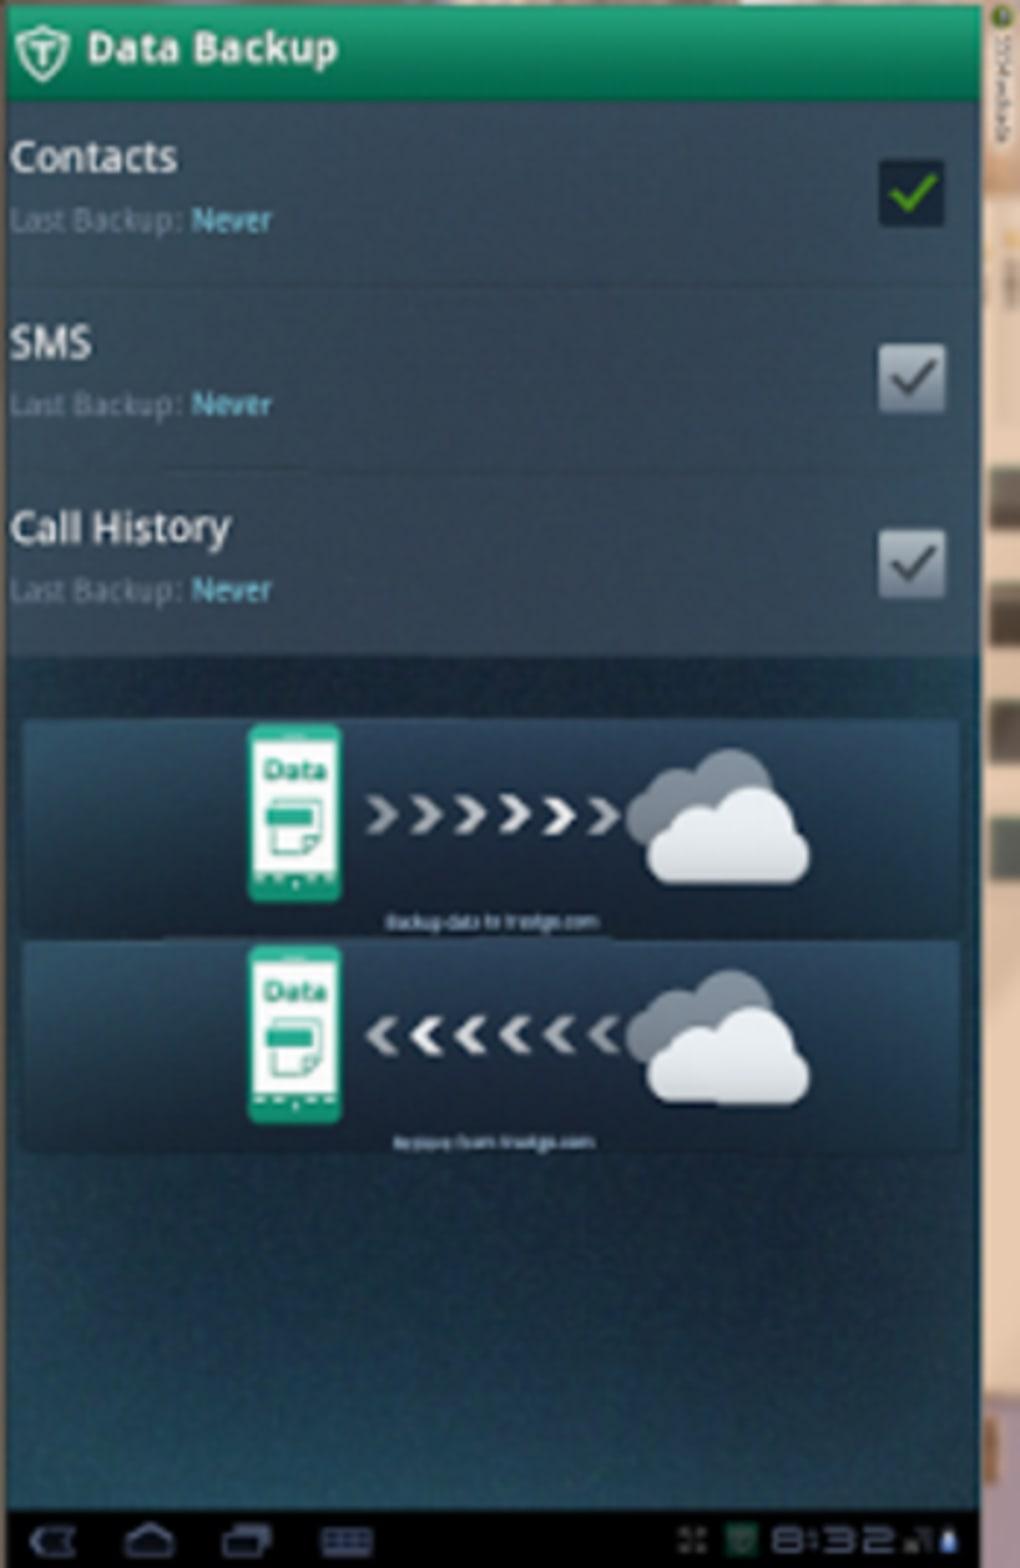 TrustGo Antivirus & Mobile Security